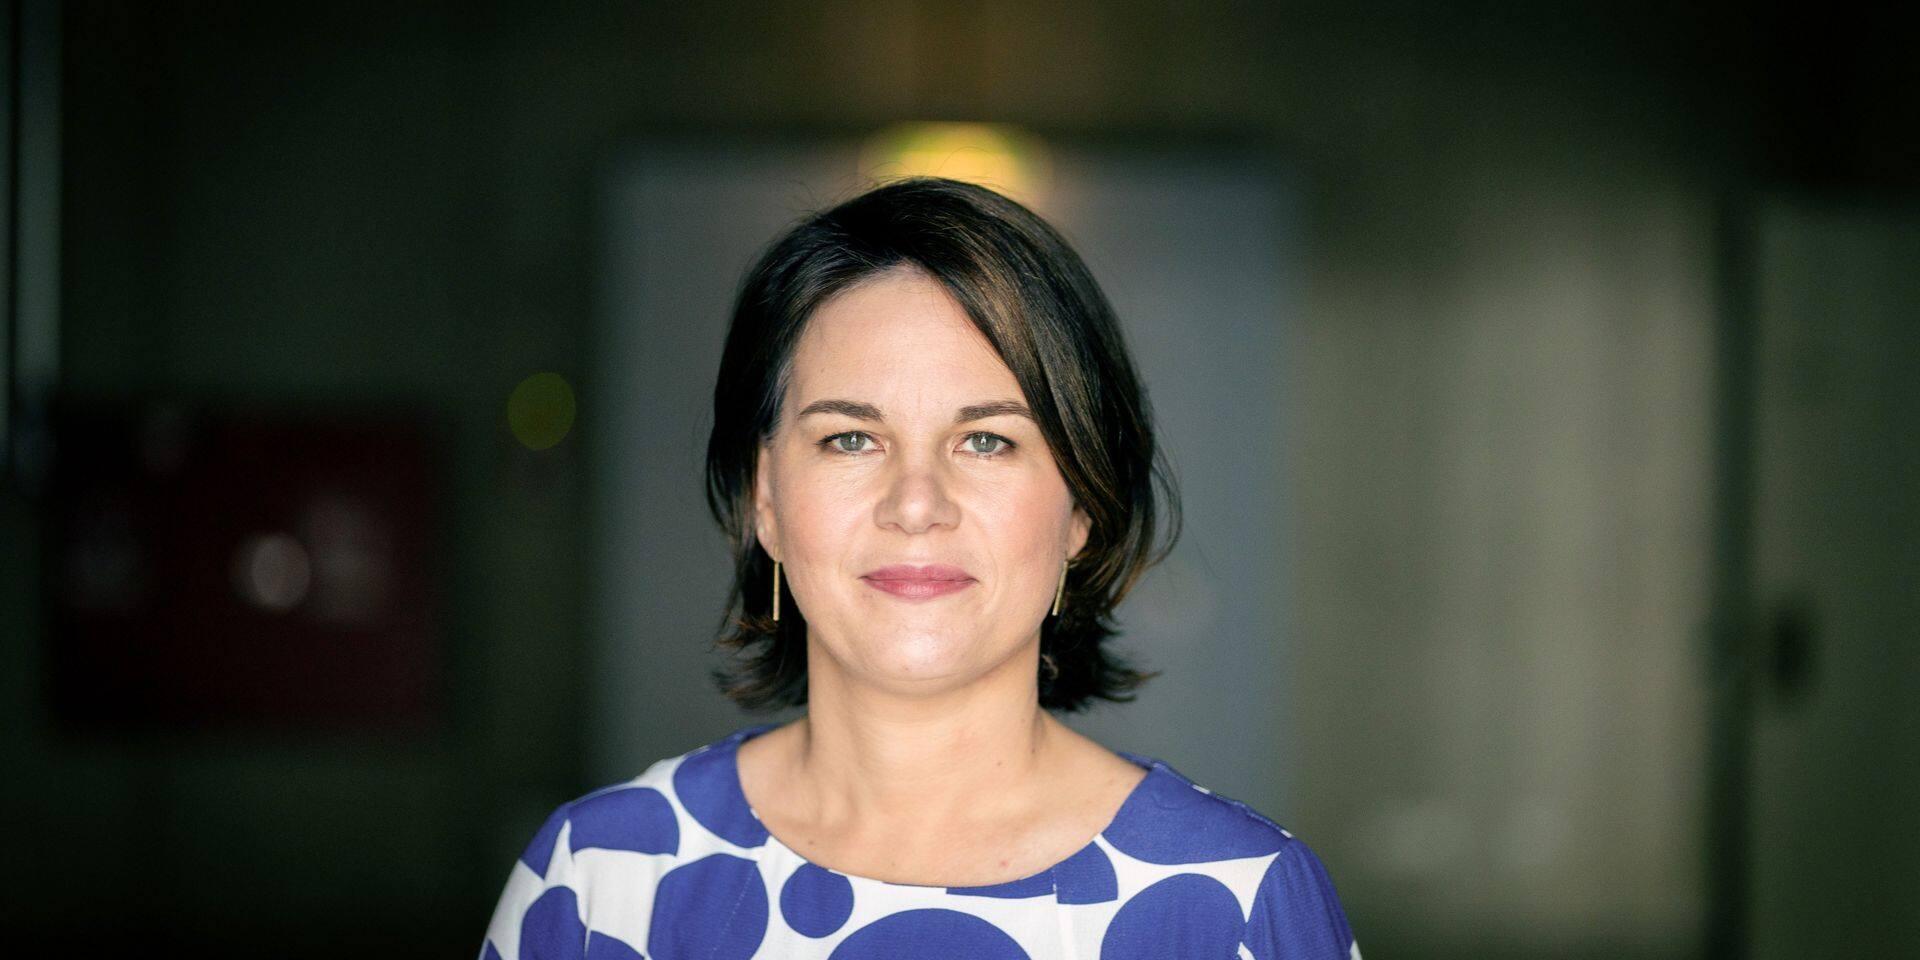 Annalena Baerbock interview with dpa in Berlin